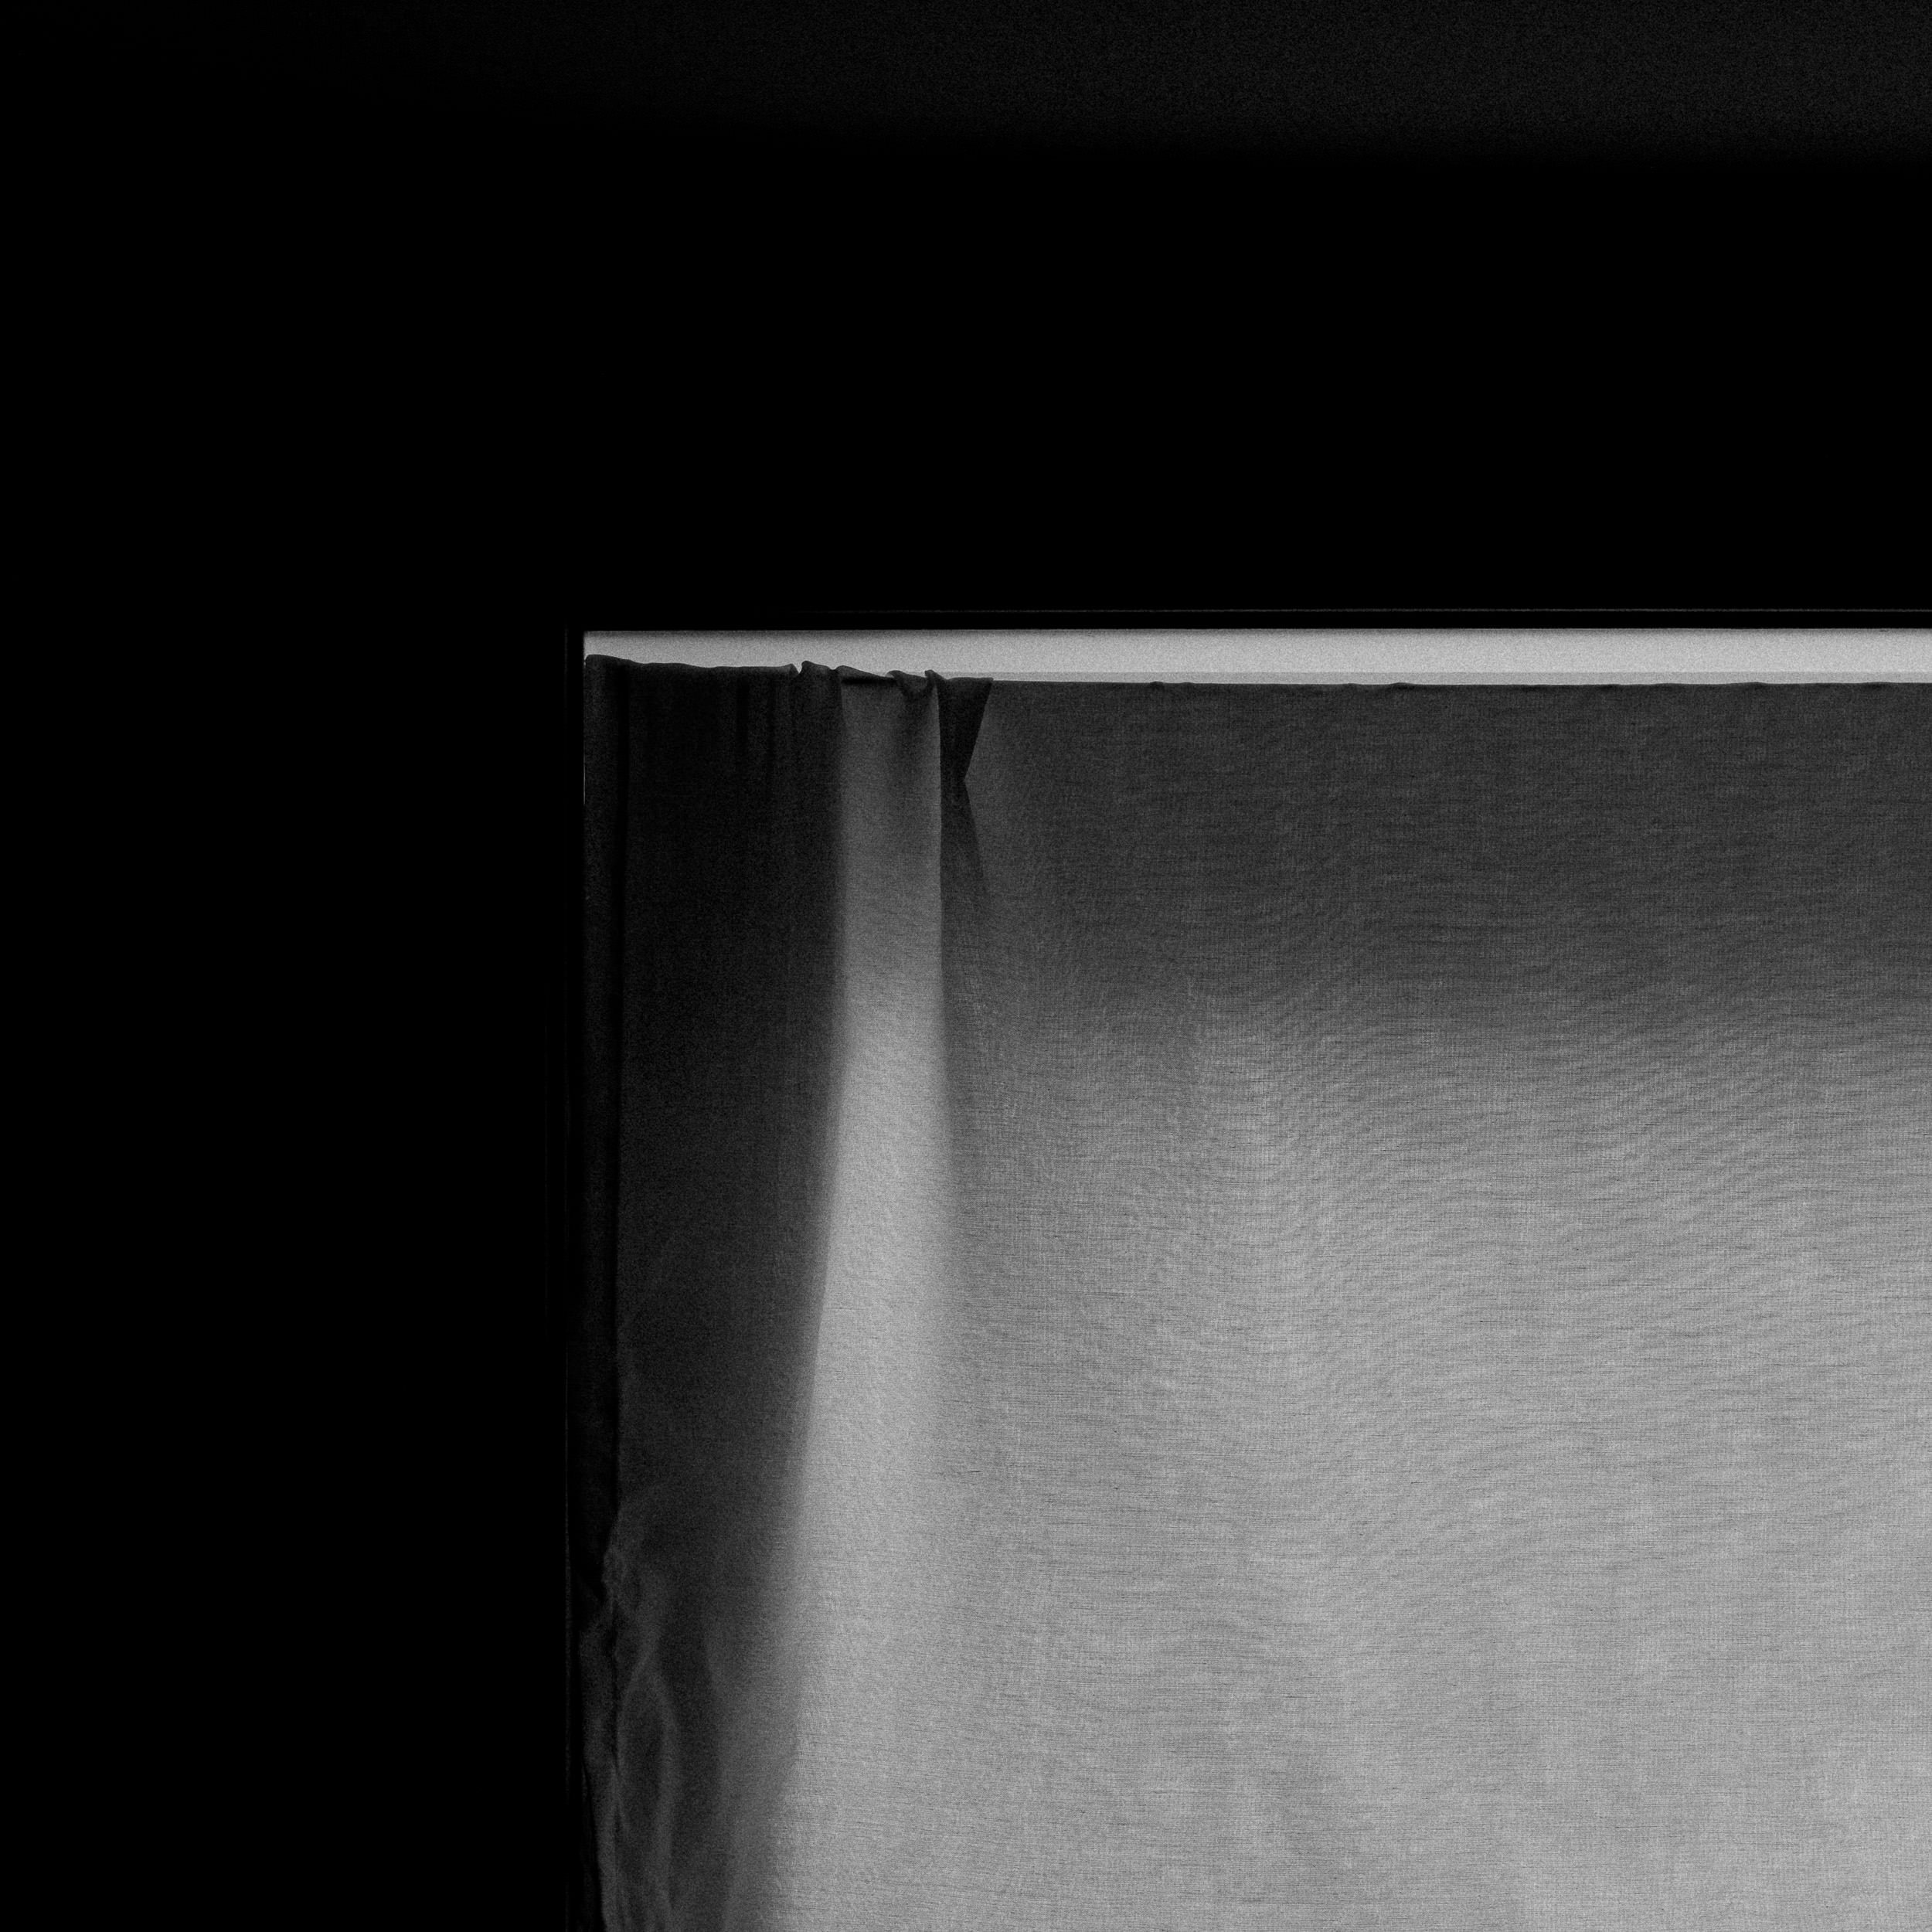 Frode_Olsen_Fine_art_photography_The_Rorschach_Exposures_10.jpg